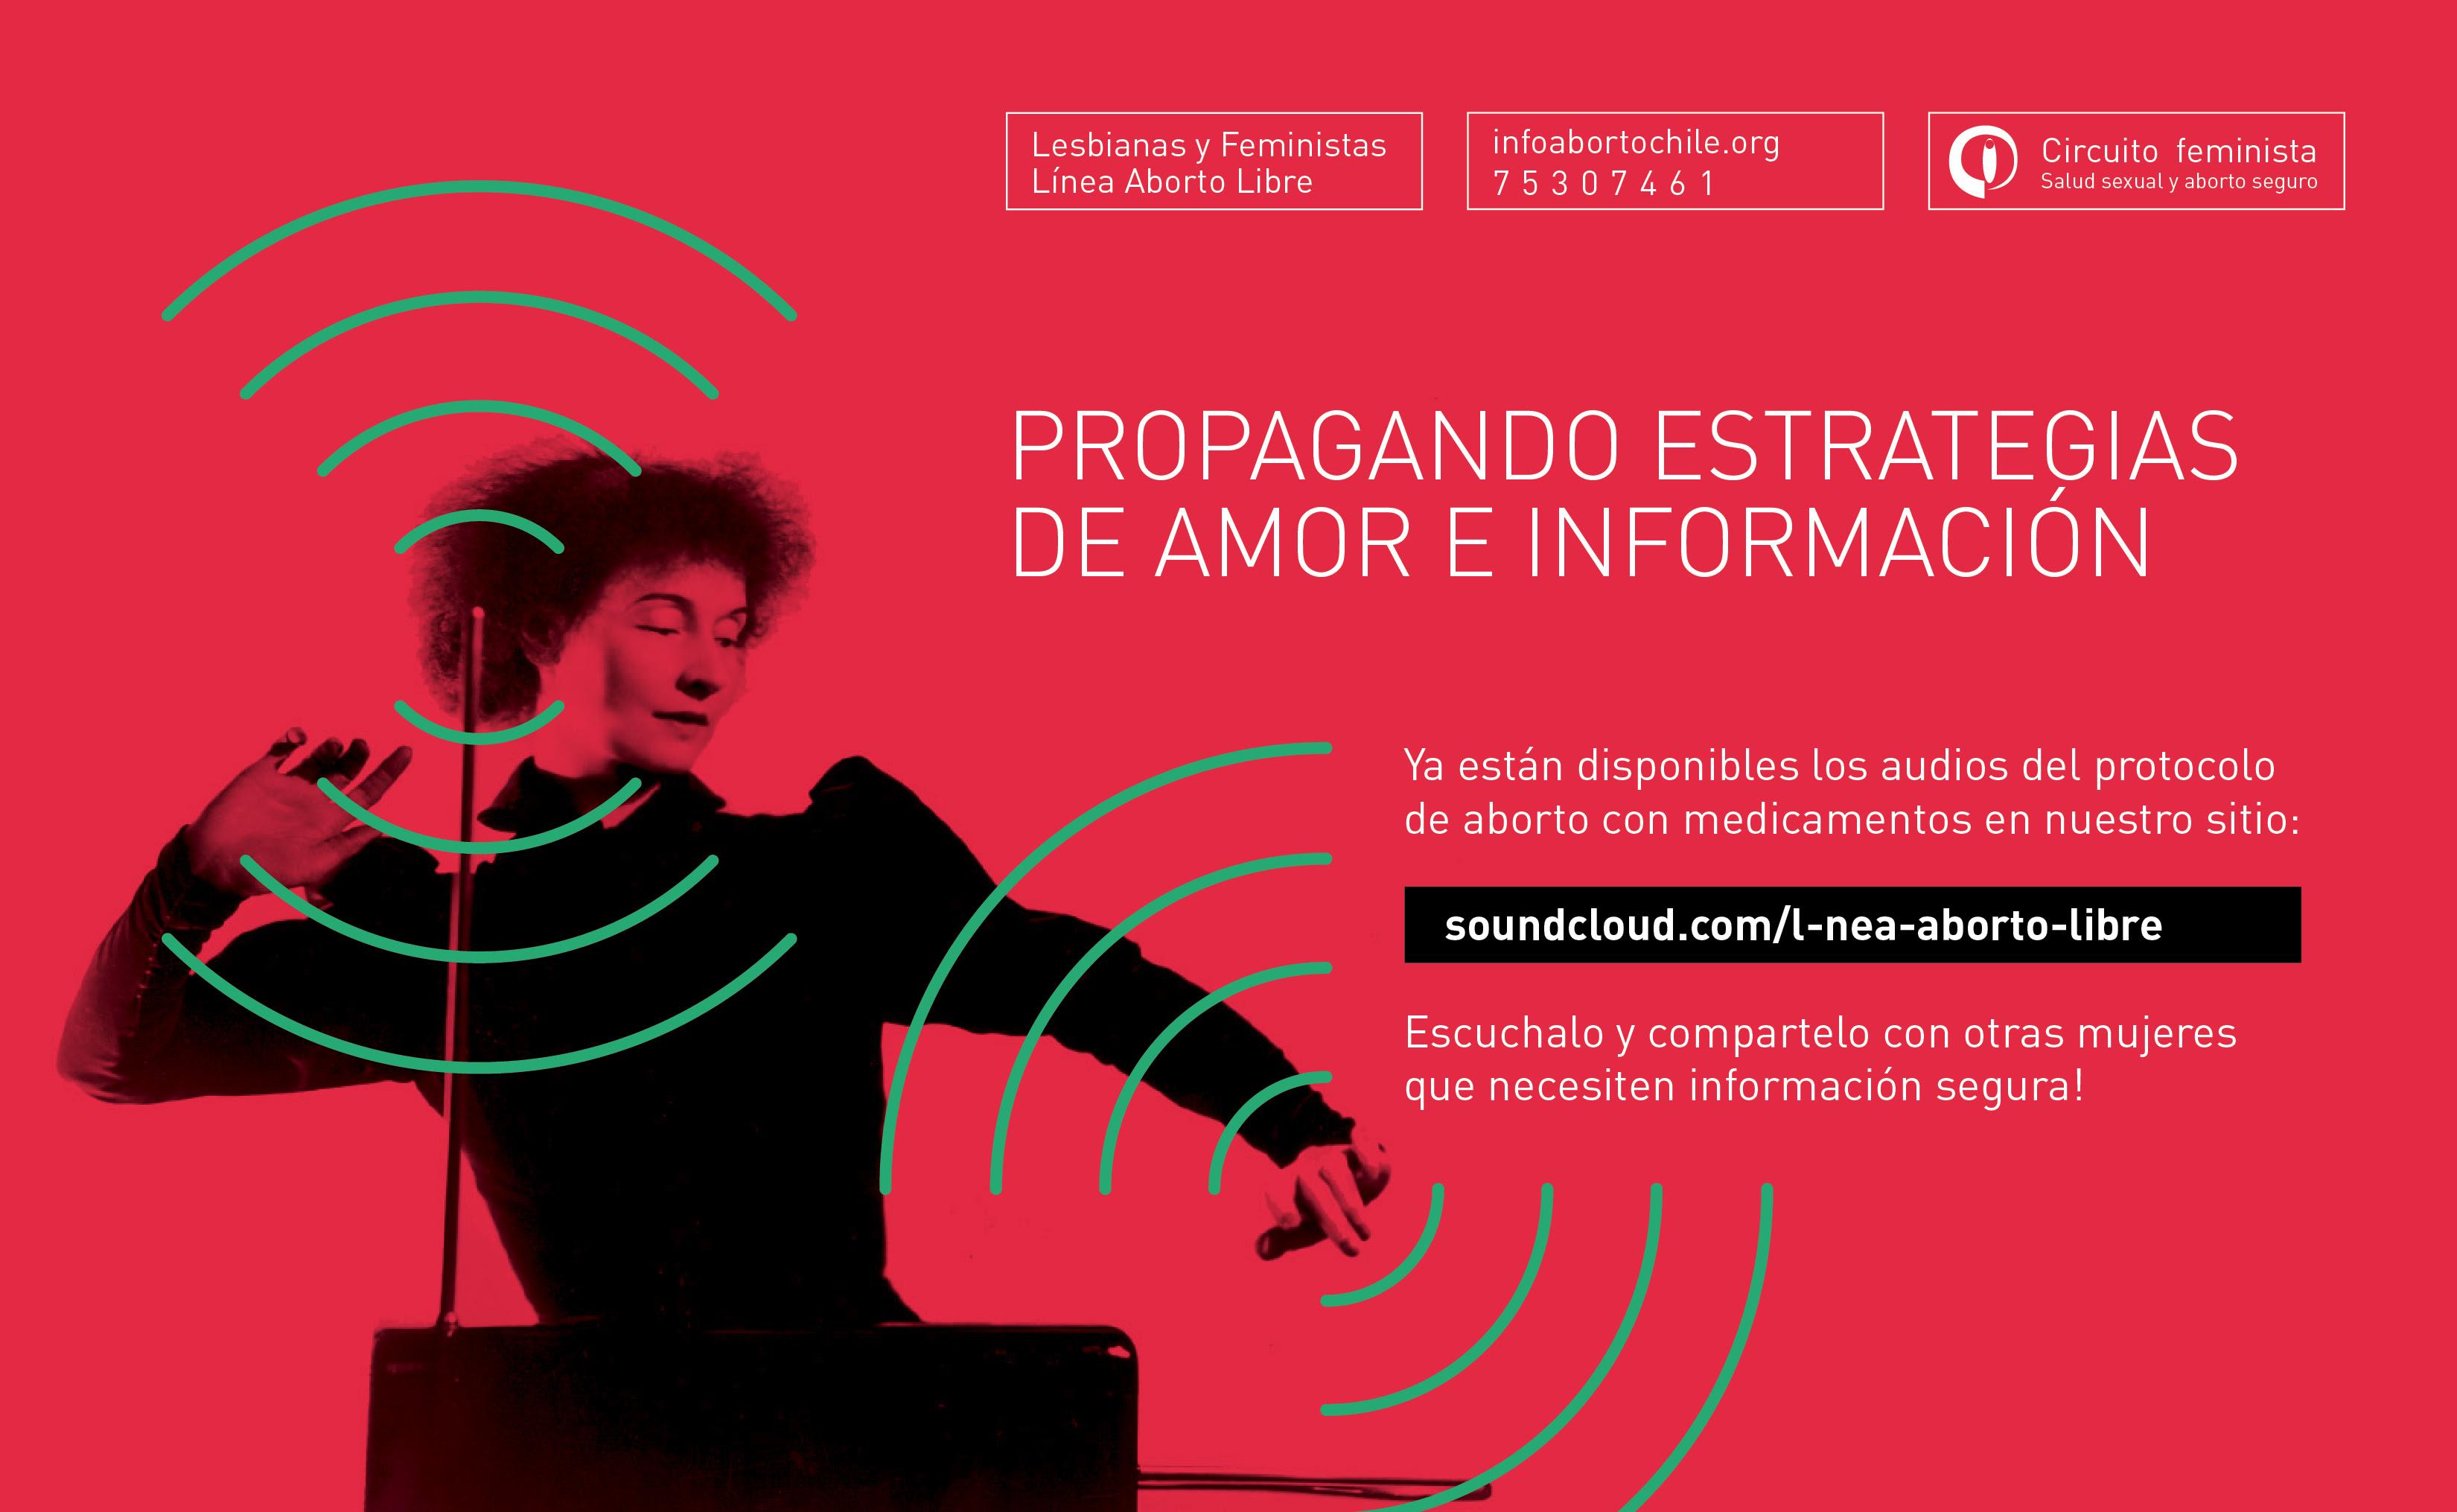 http://infoabortochile.org/wp-content/uploads/2016/02/audios.jpg